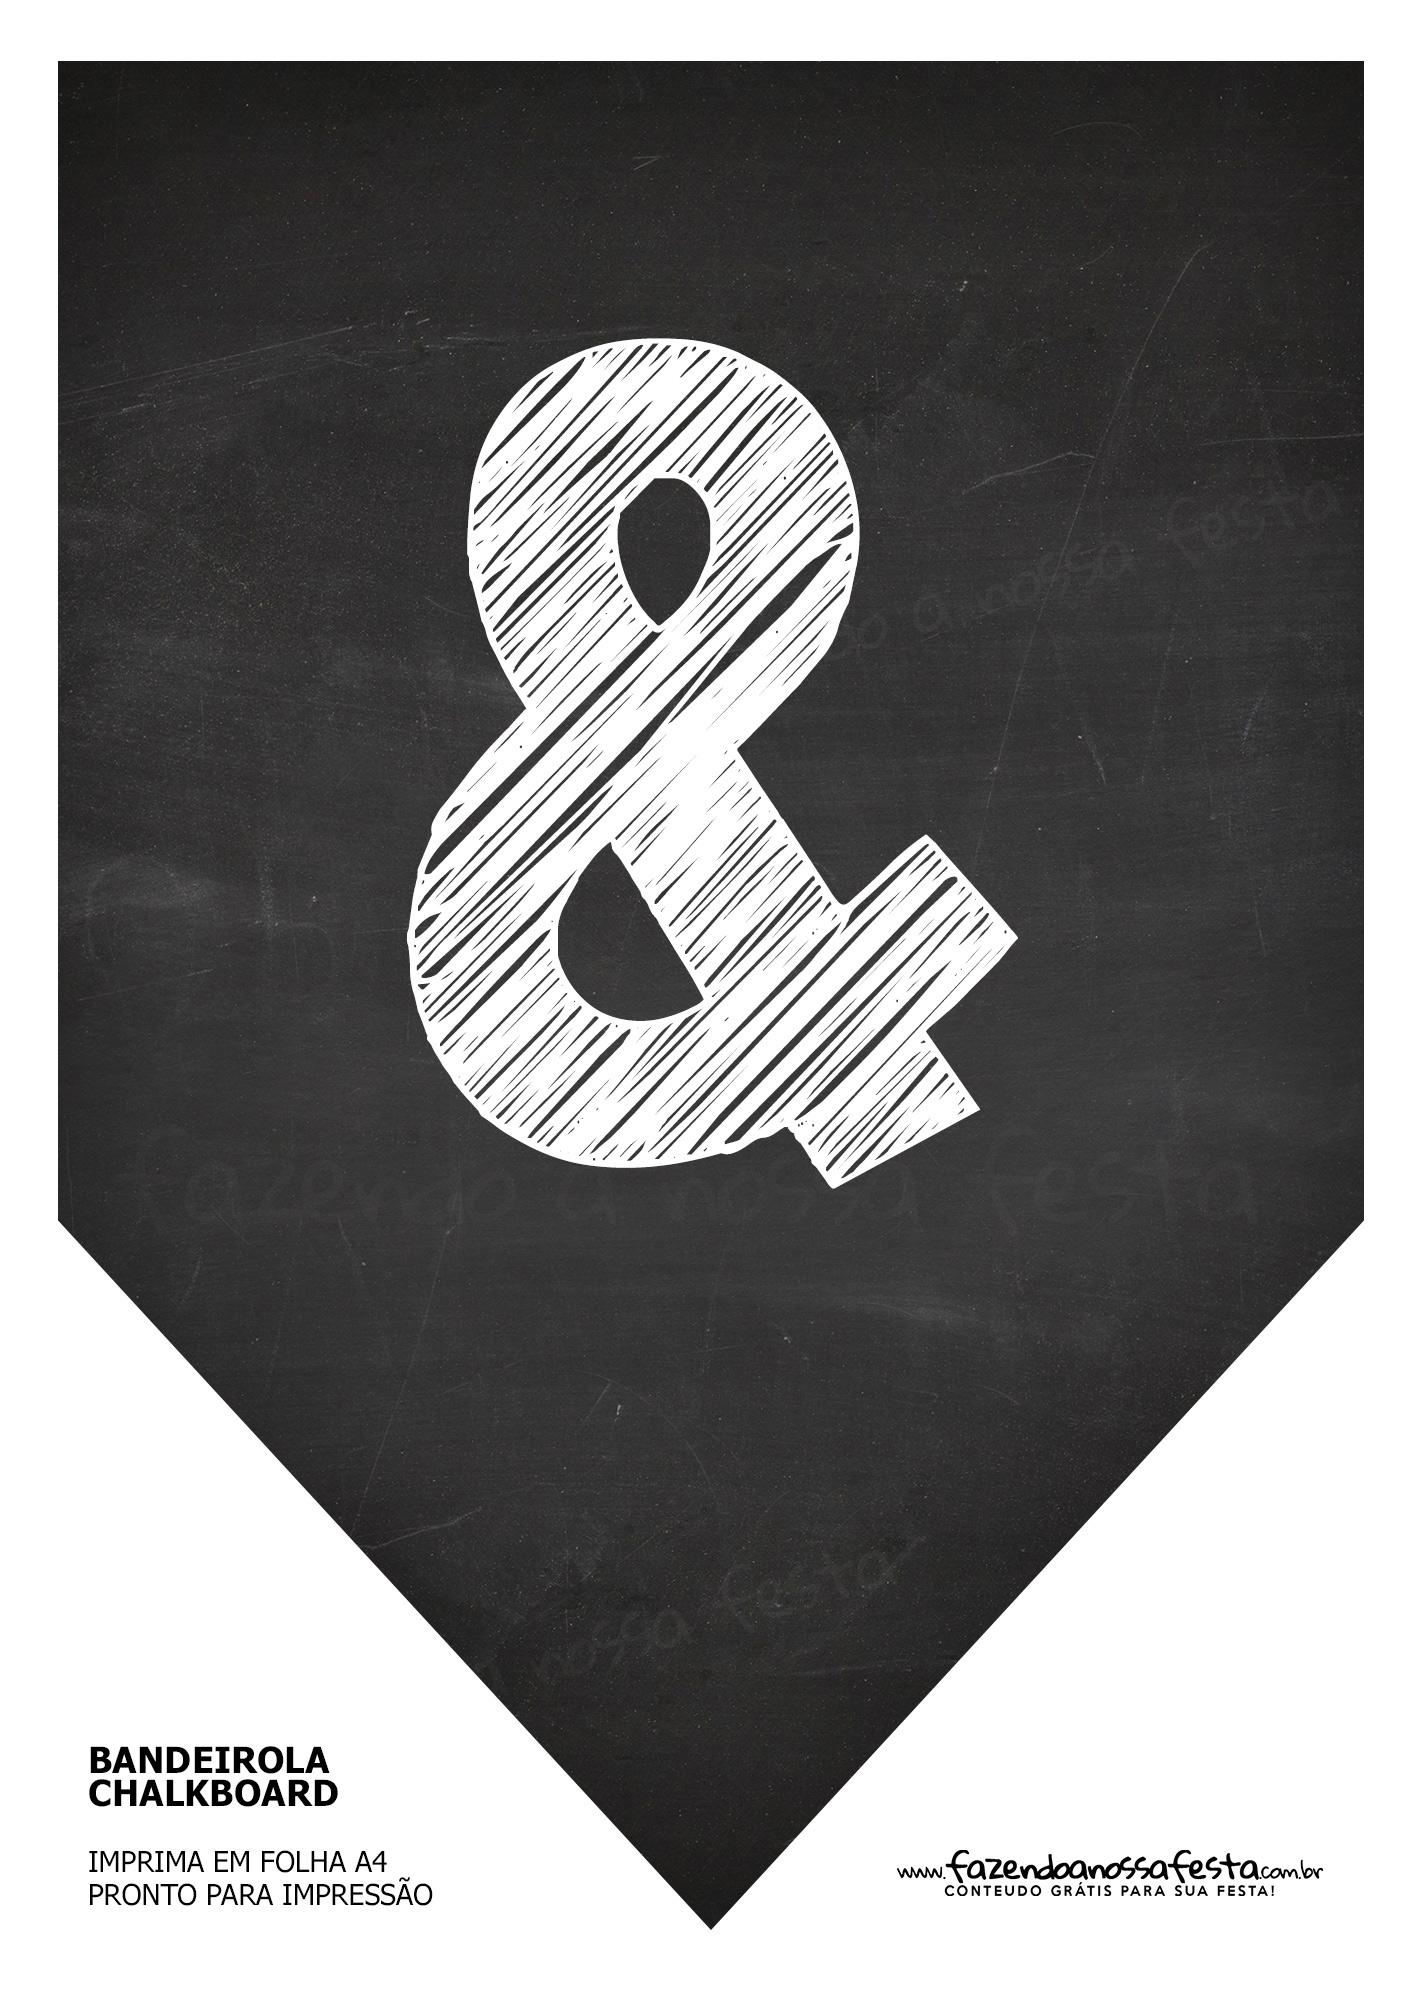 Bandeirinha Chalkboard &